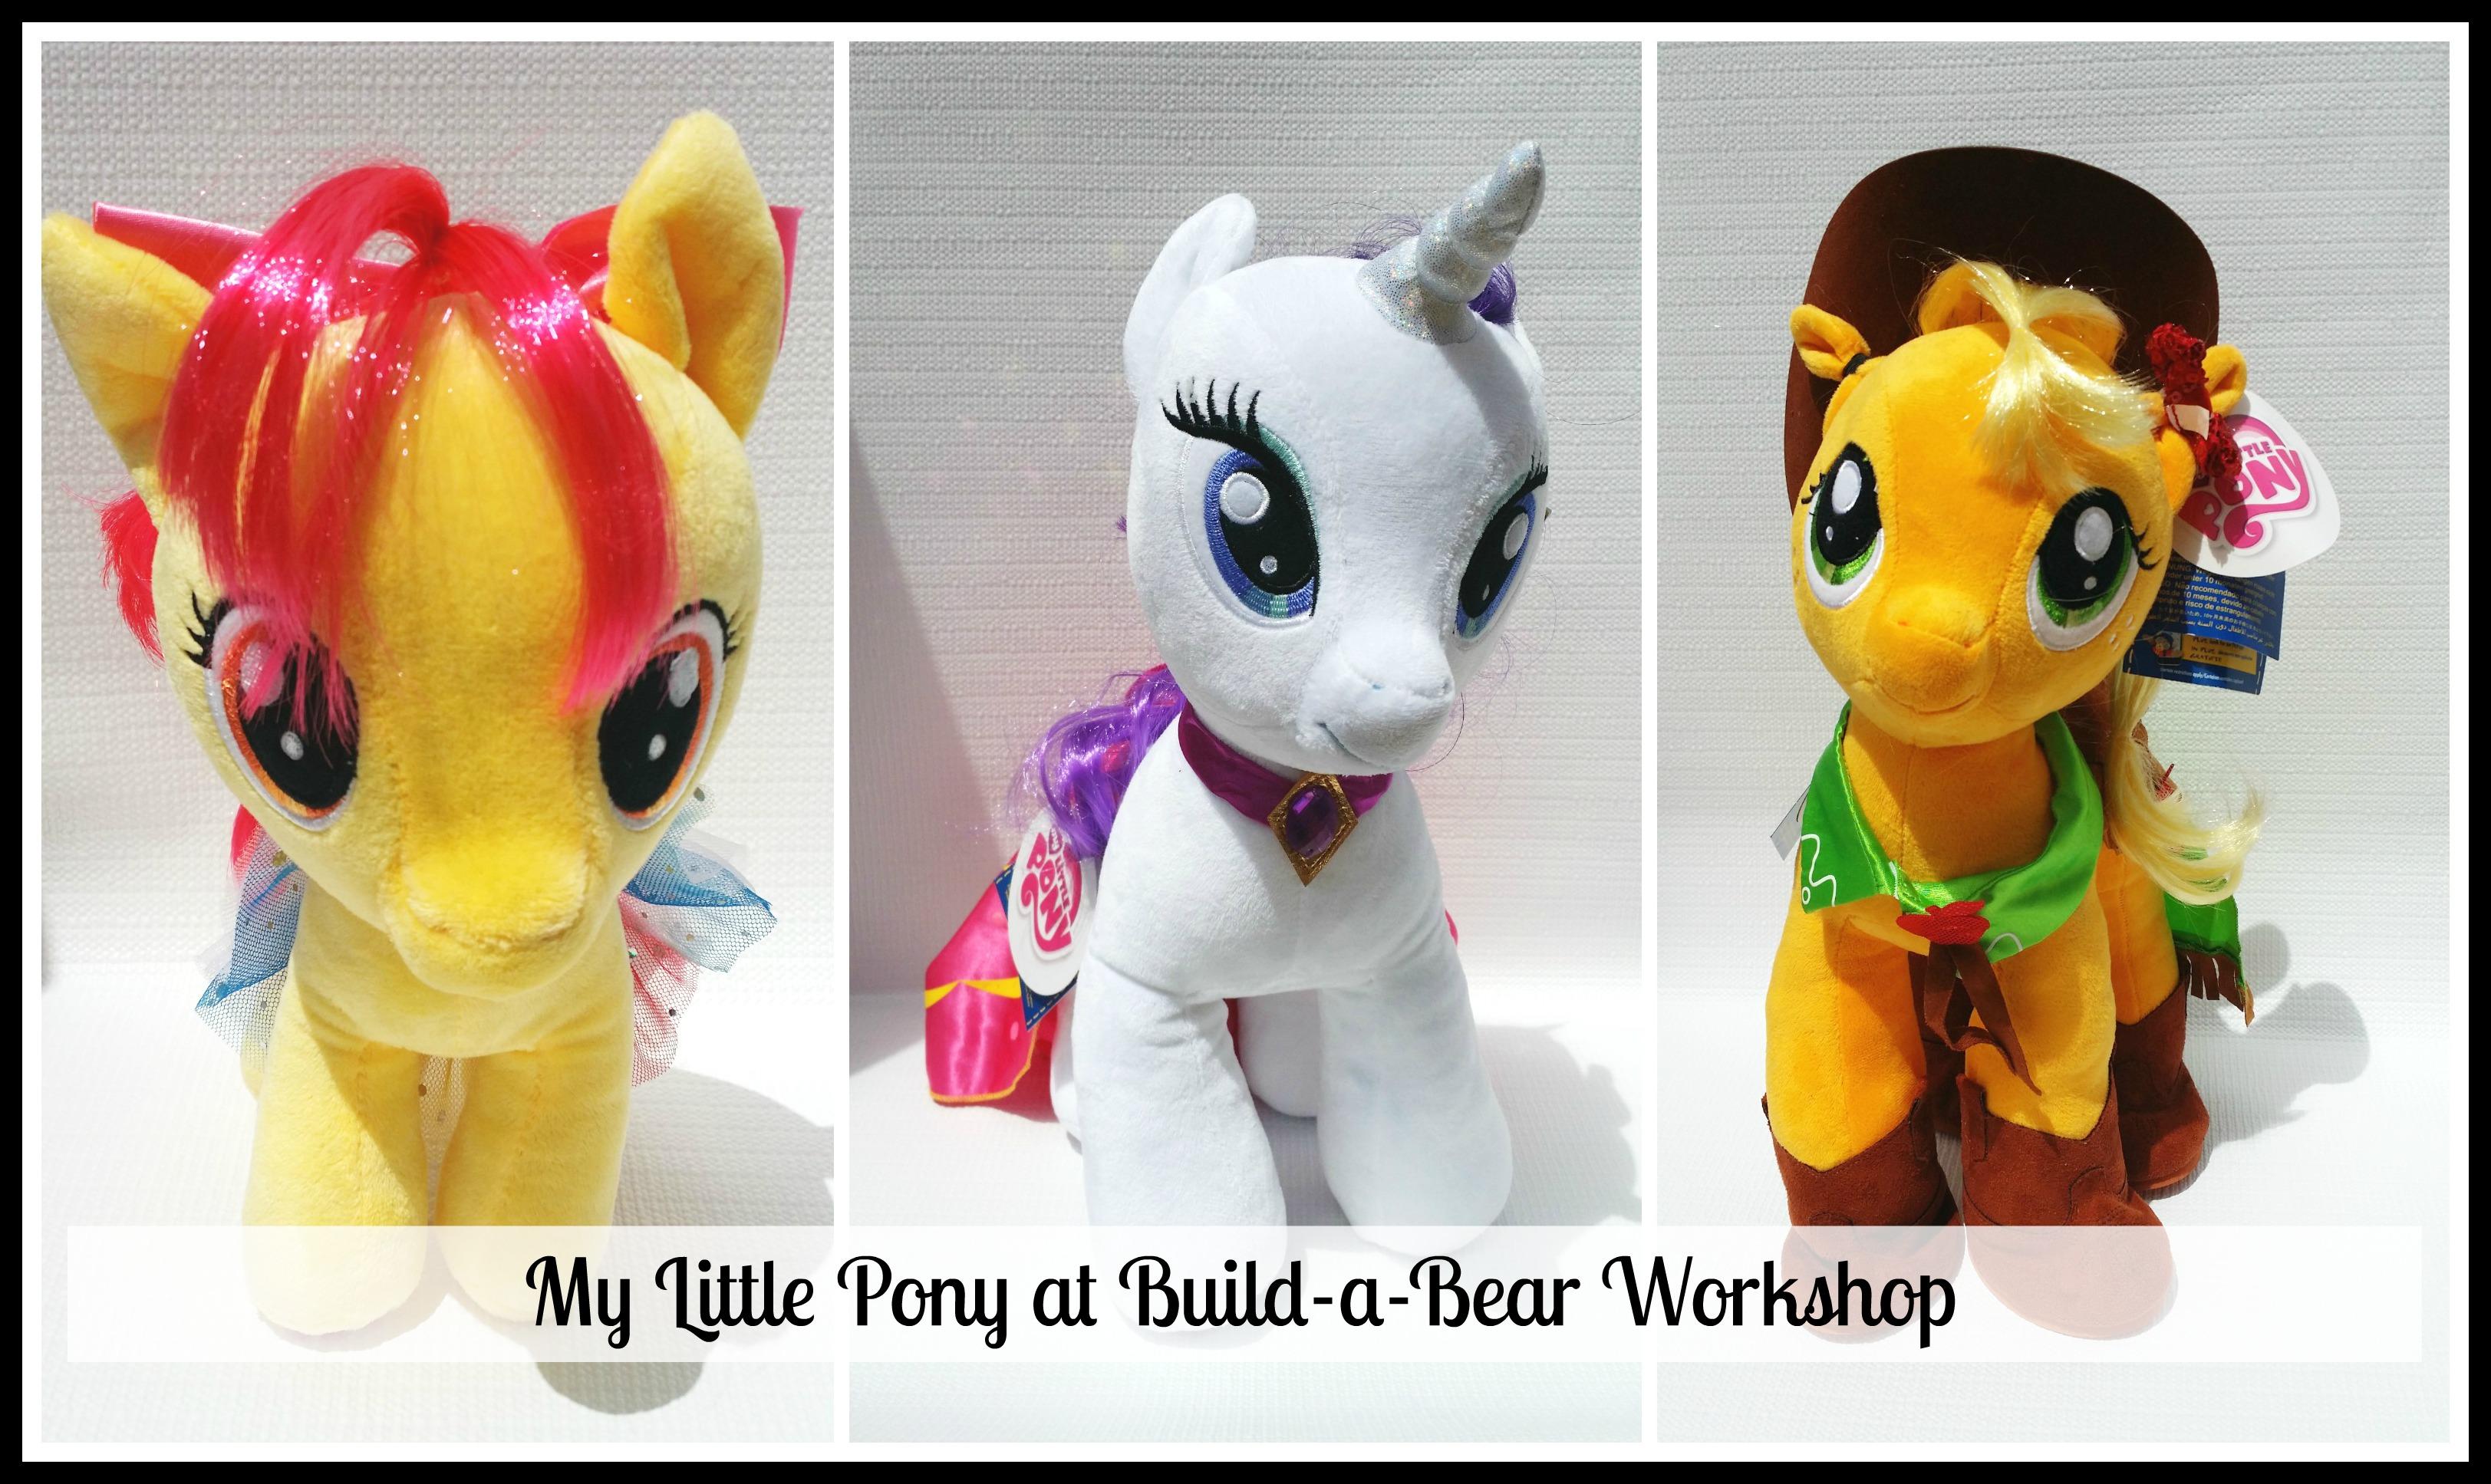 Drawn my little pony fluttershy build a bear Cori's Bear Kid to ponies